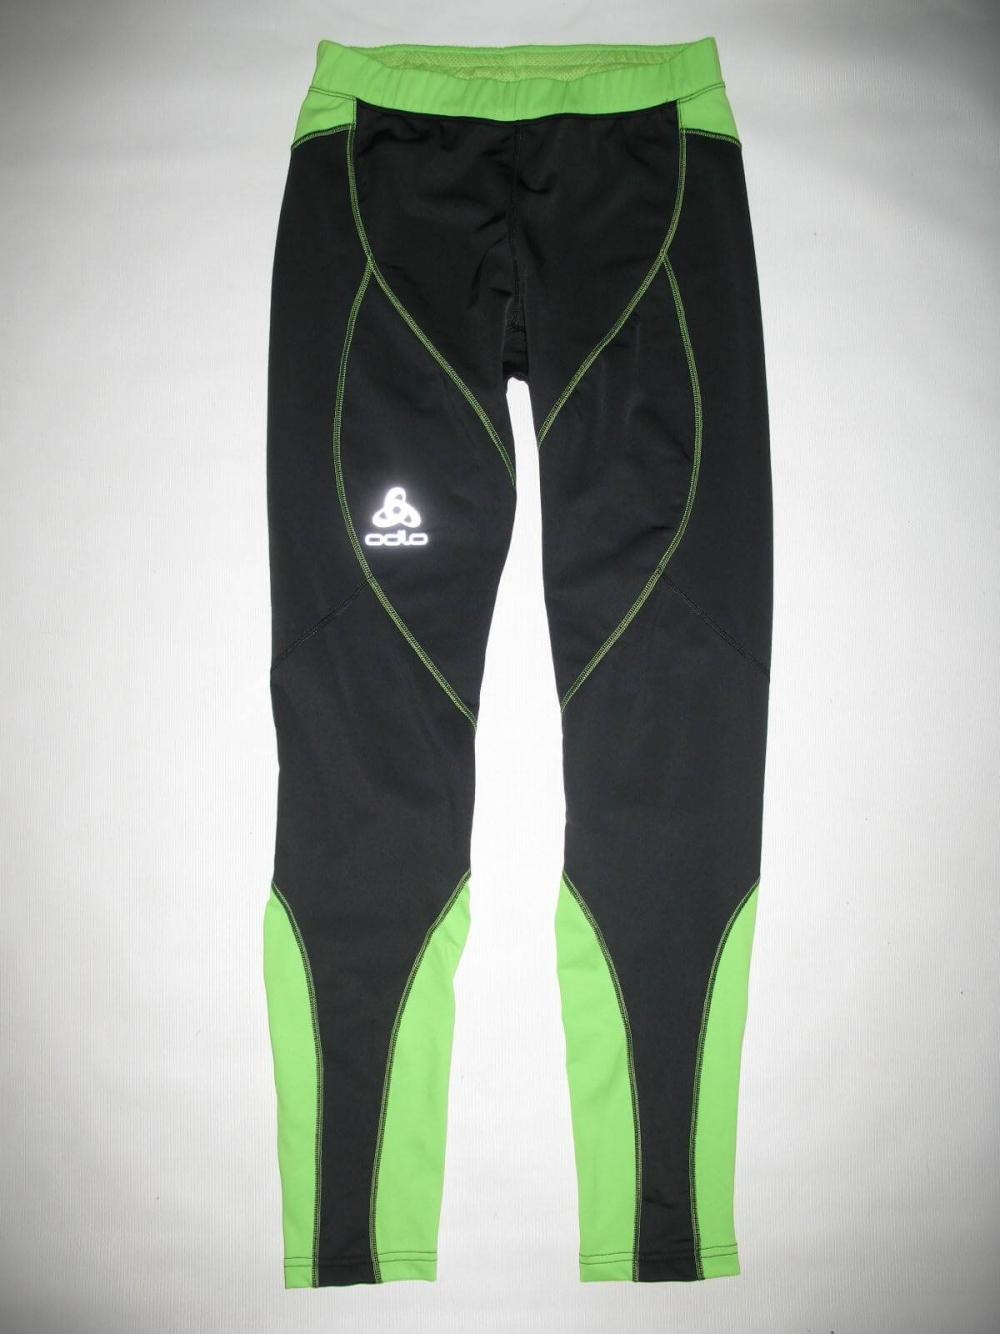 Штаны ODLO fury warm tights (размер M) - 2